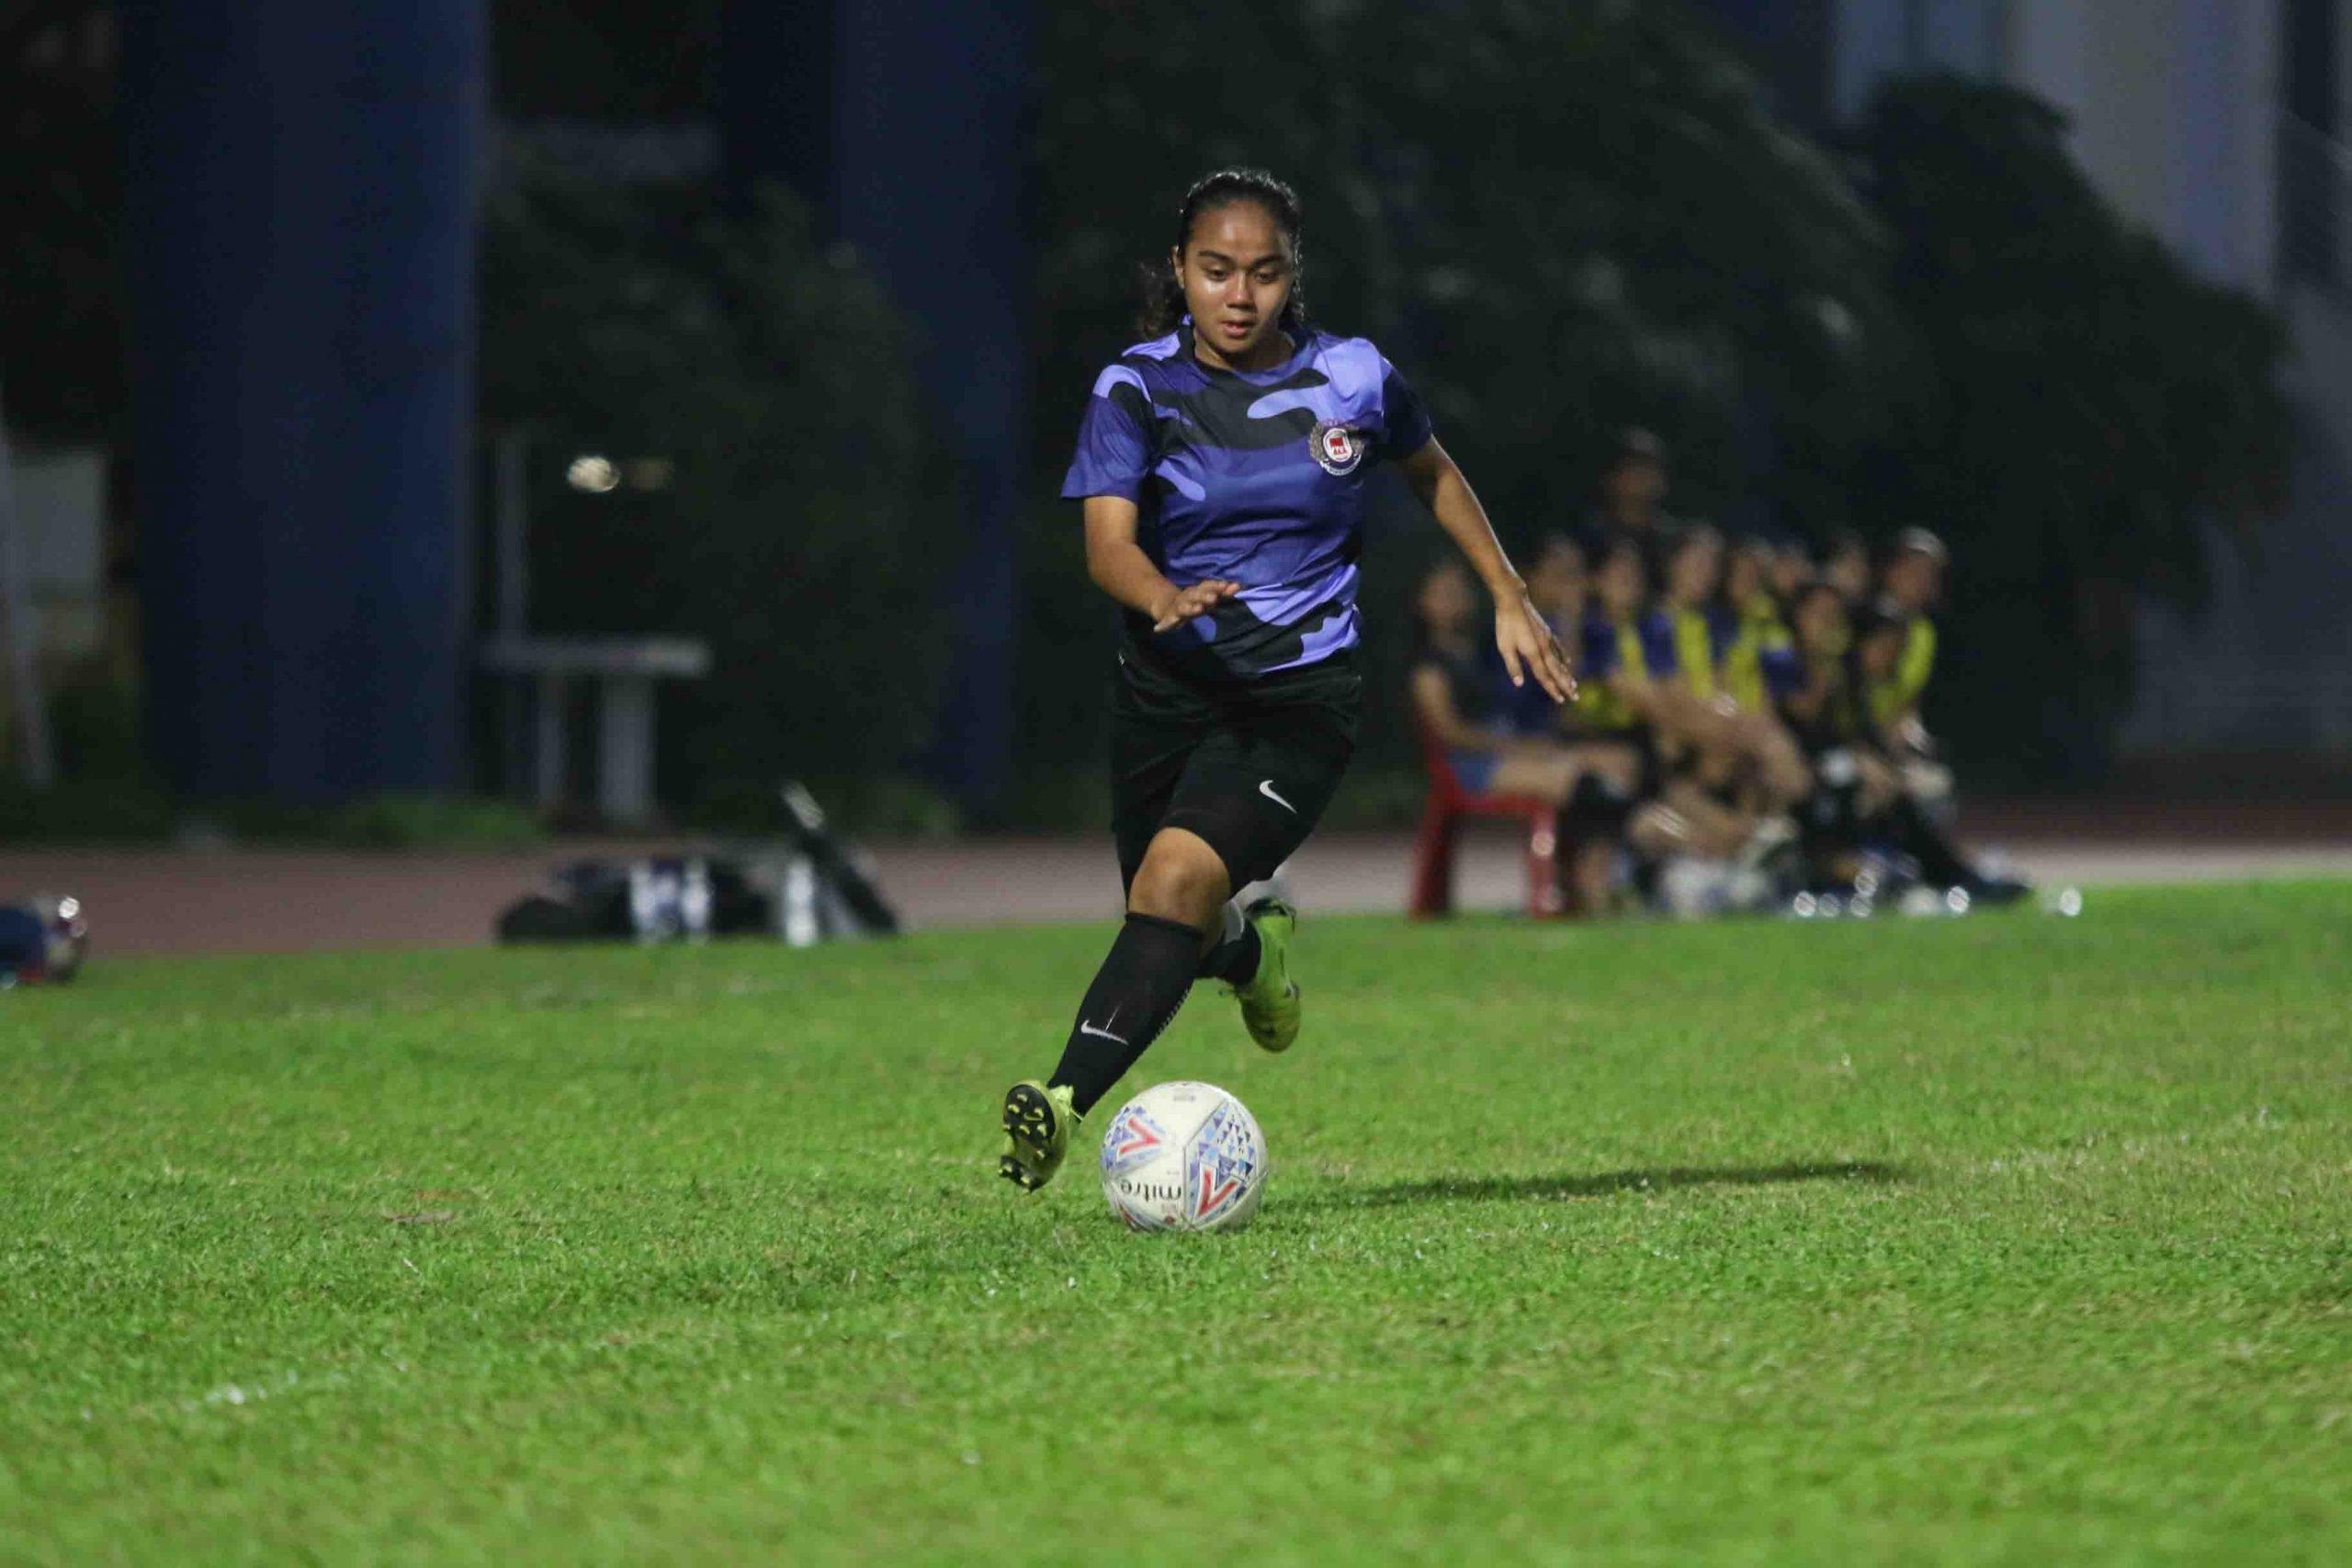 Siti Nor Aqilah Binte Md Shazali (ITE #14) speeds down the wing. (Photo 5 © Clara Lau/Red Sports)